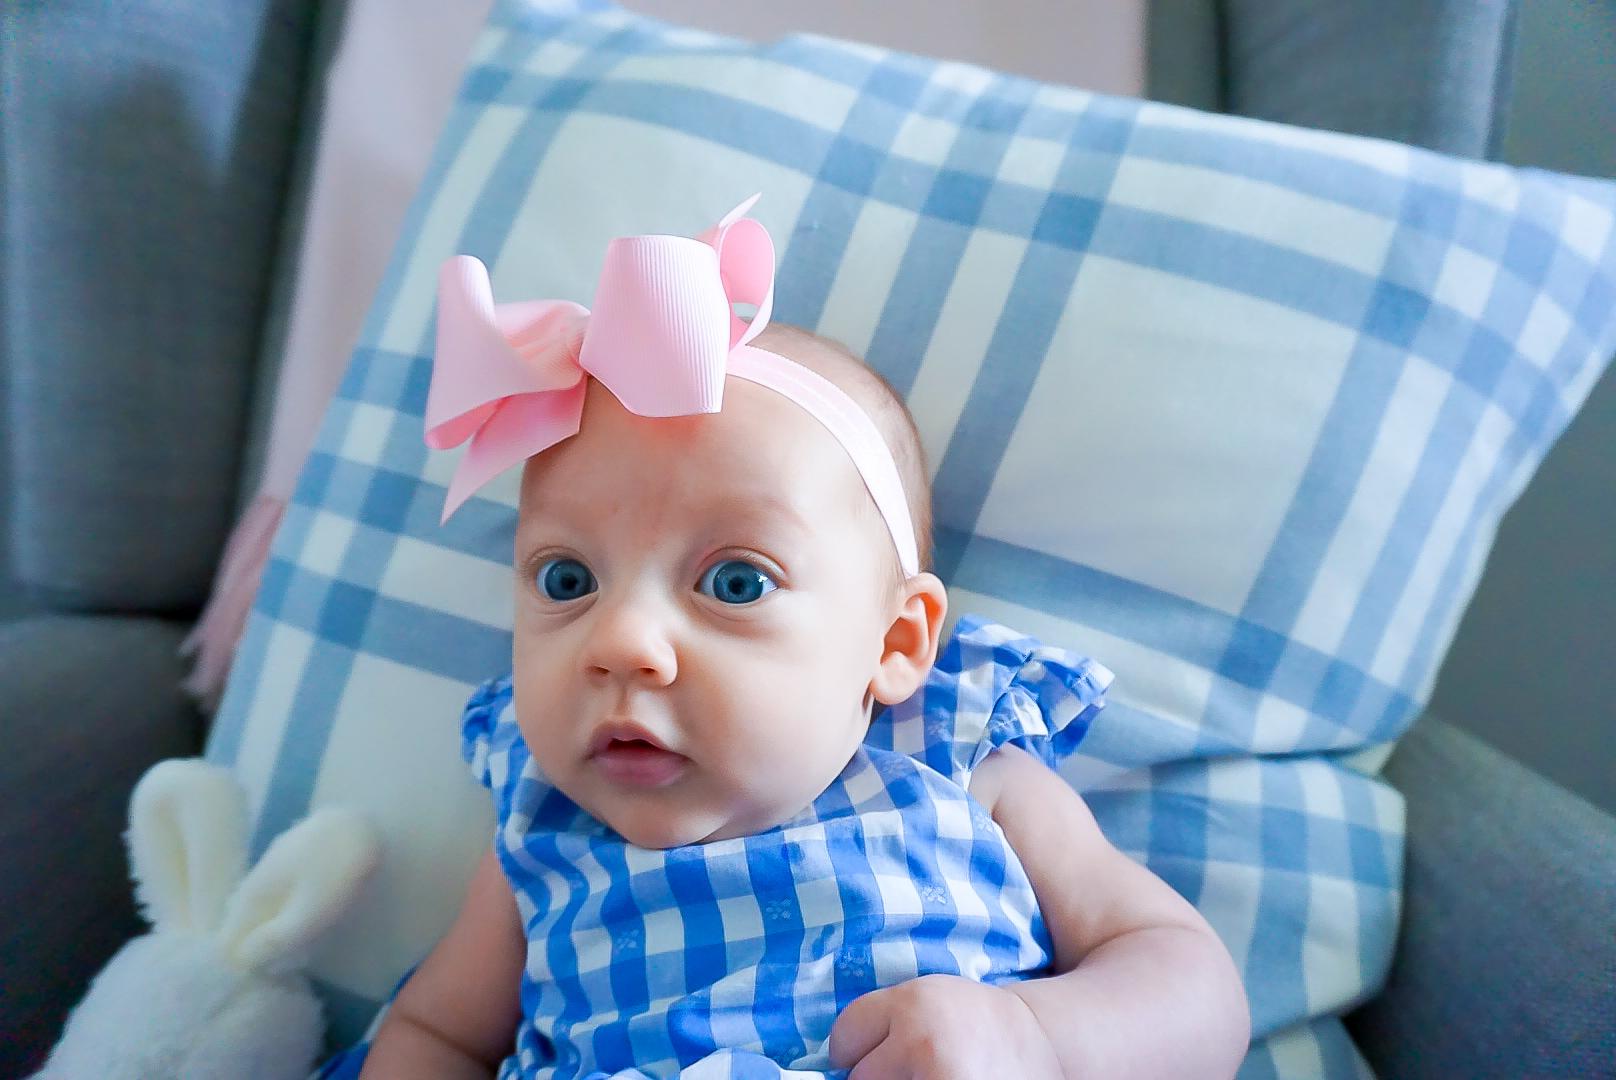 mom blogger, motherhood blog, 3 month old baby update, family blogger